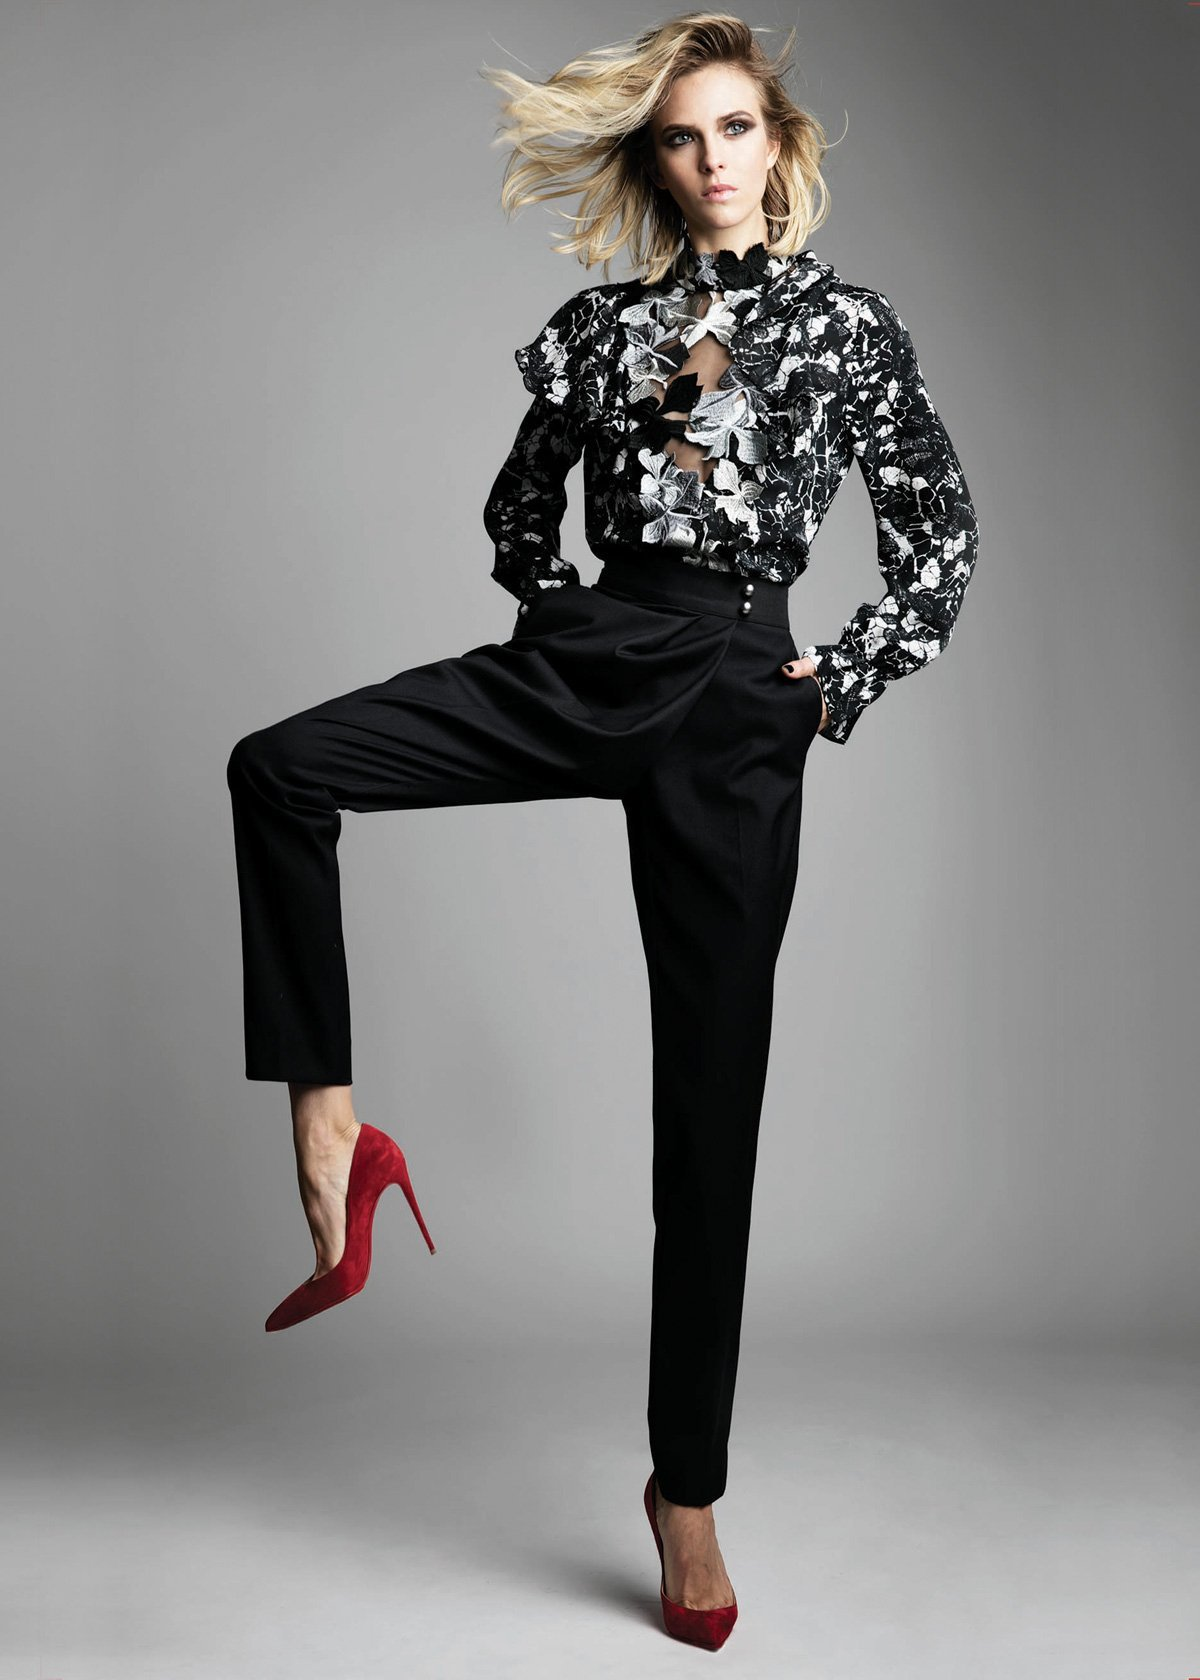 huberto-blouse_1200x.progressive.jpg